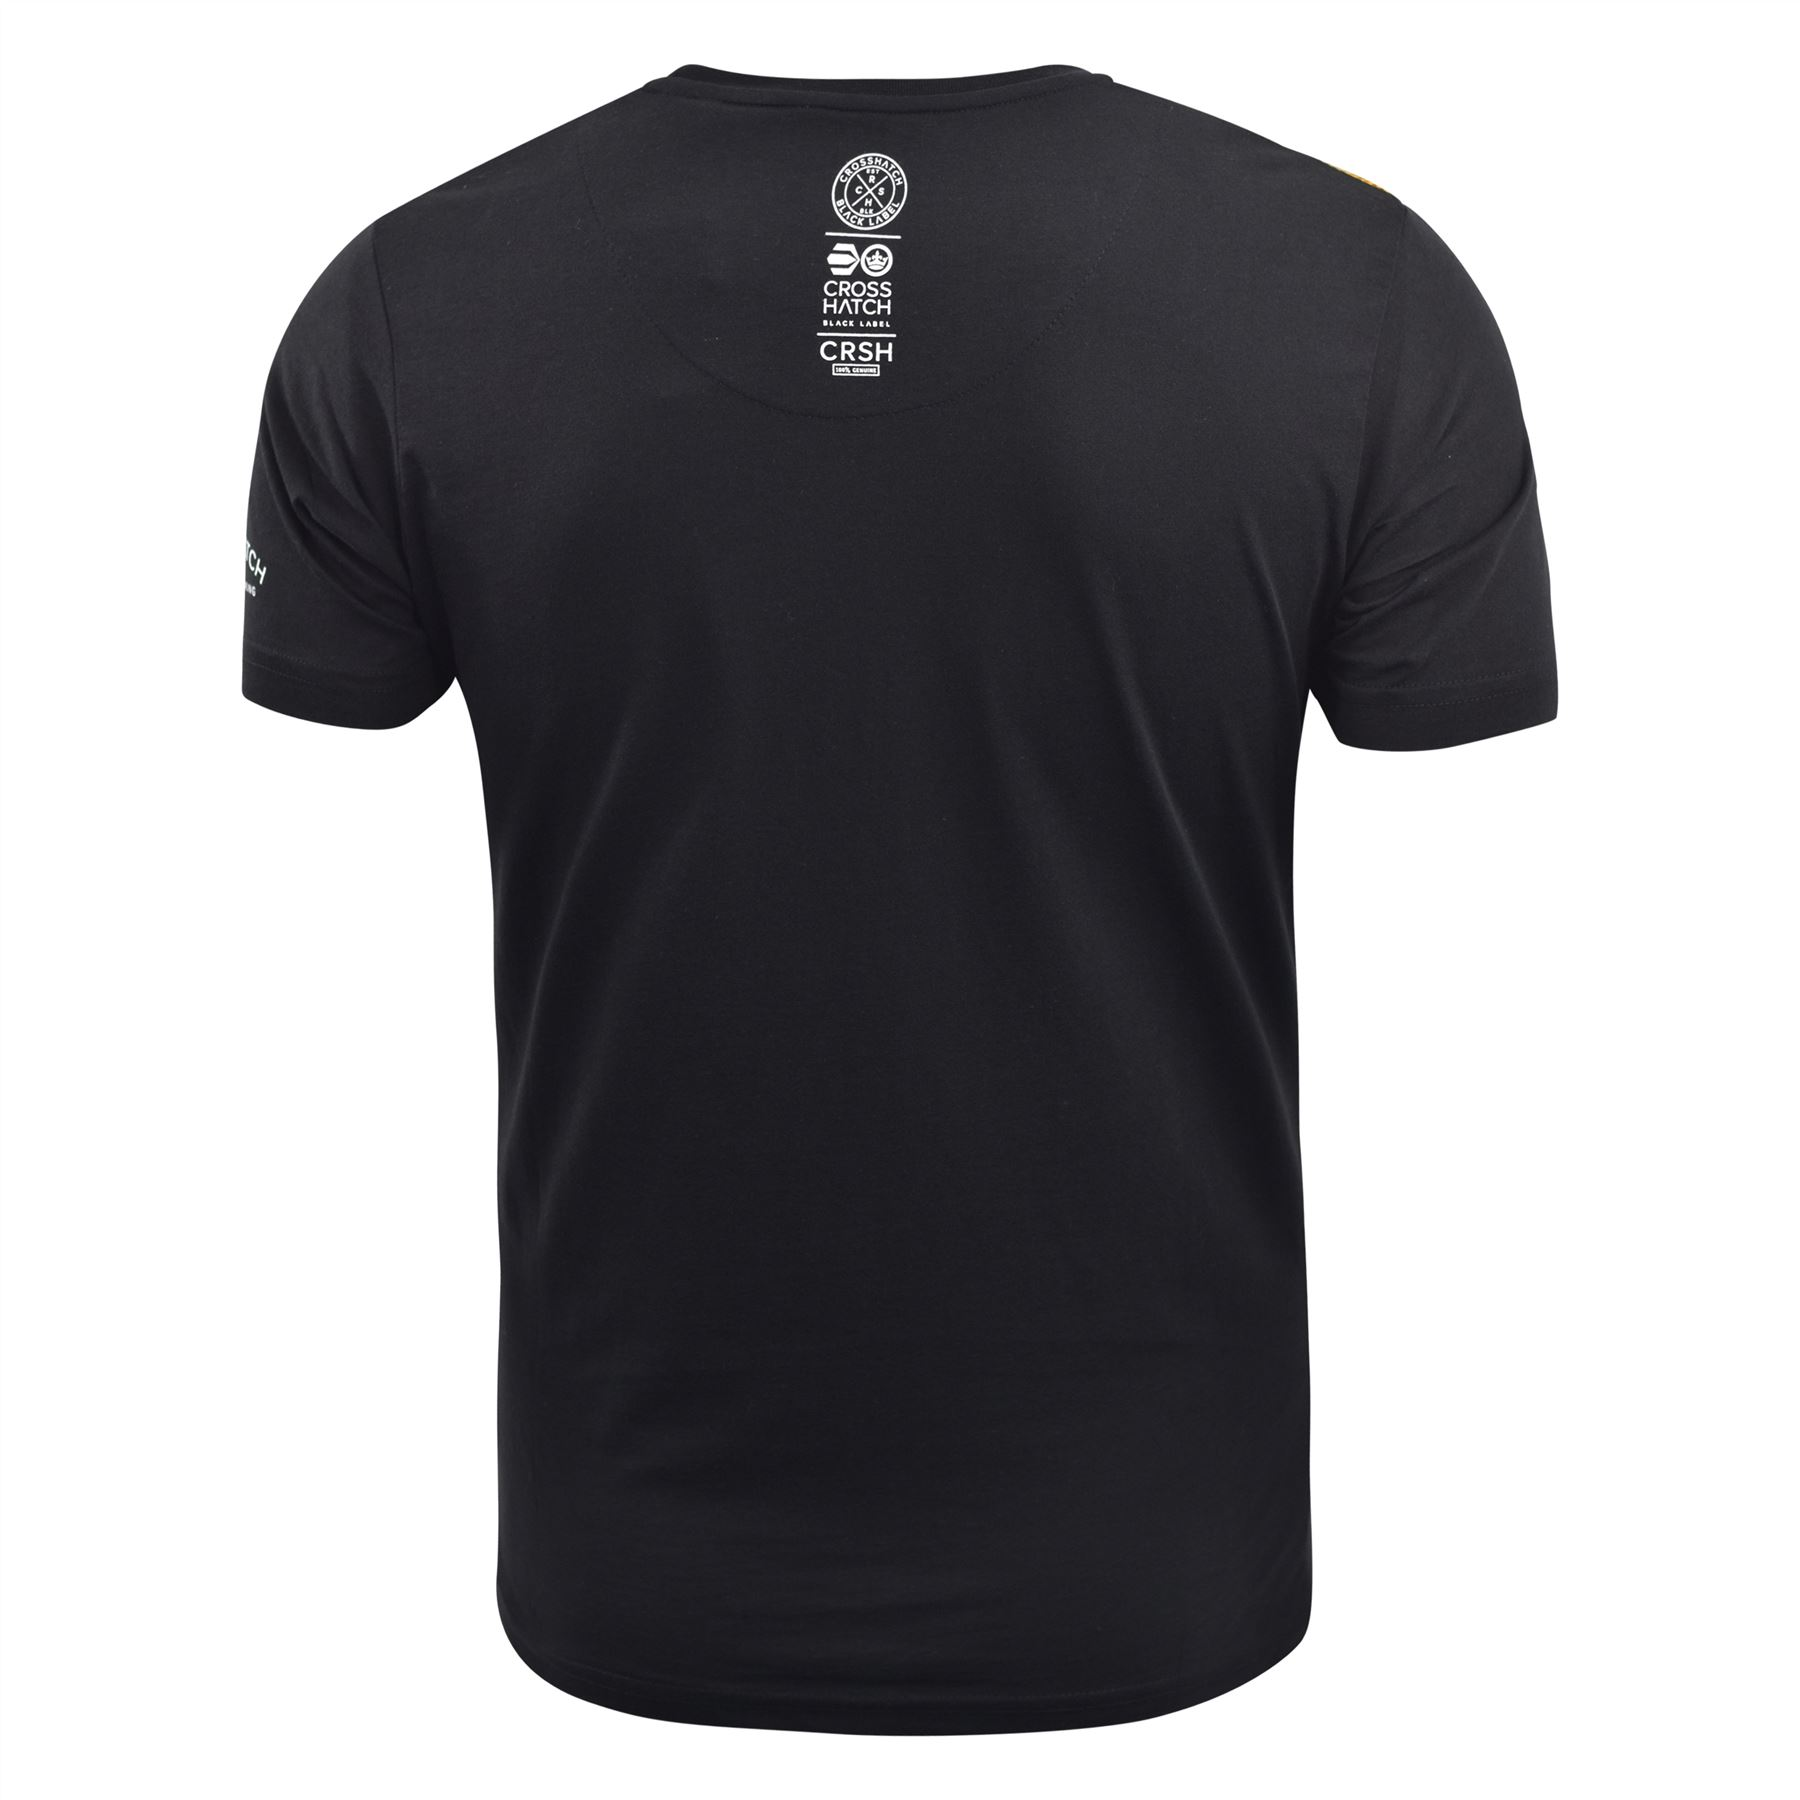 Mens-T-Shirt-Crosshatch-Short-Sleeve-Crew-Neck-Graphic-Tee-Top thumbnail 6